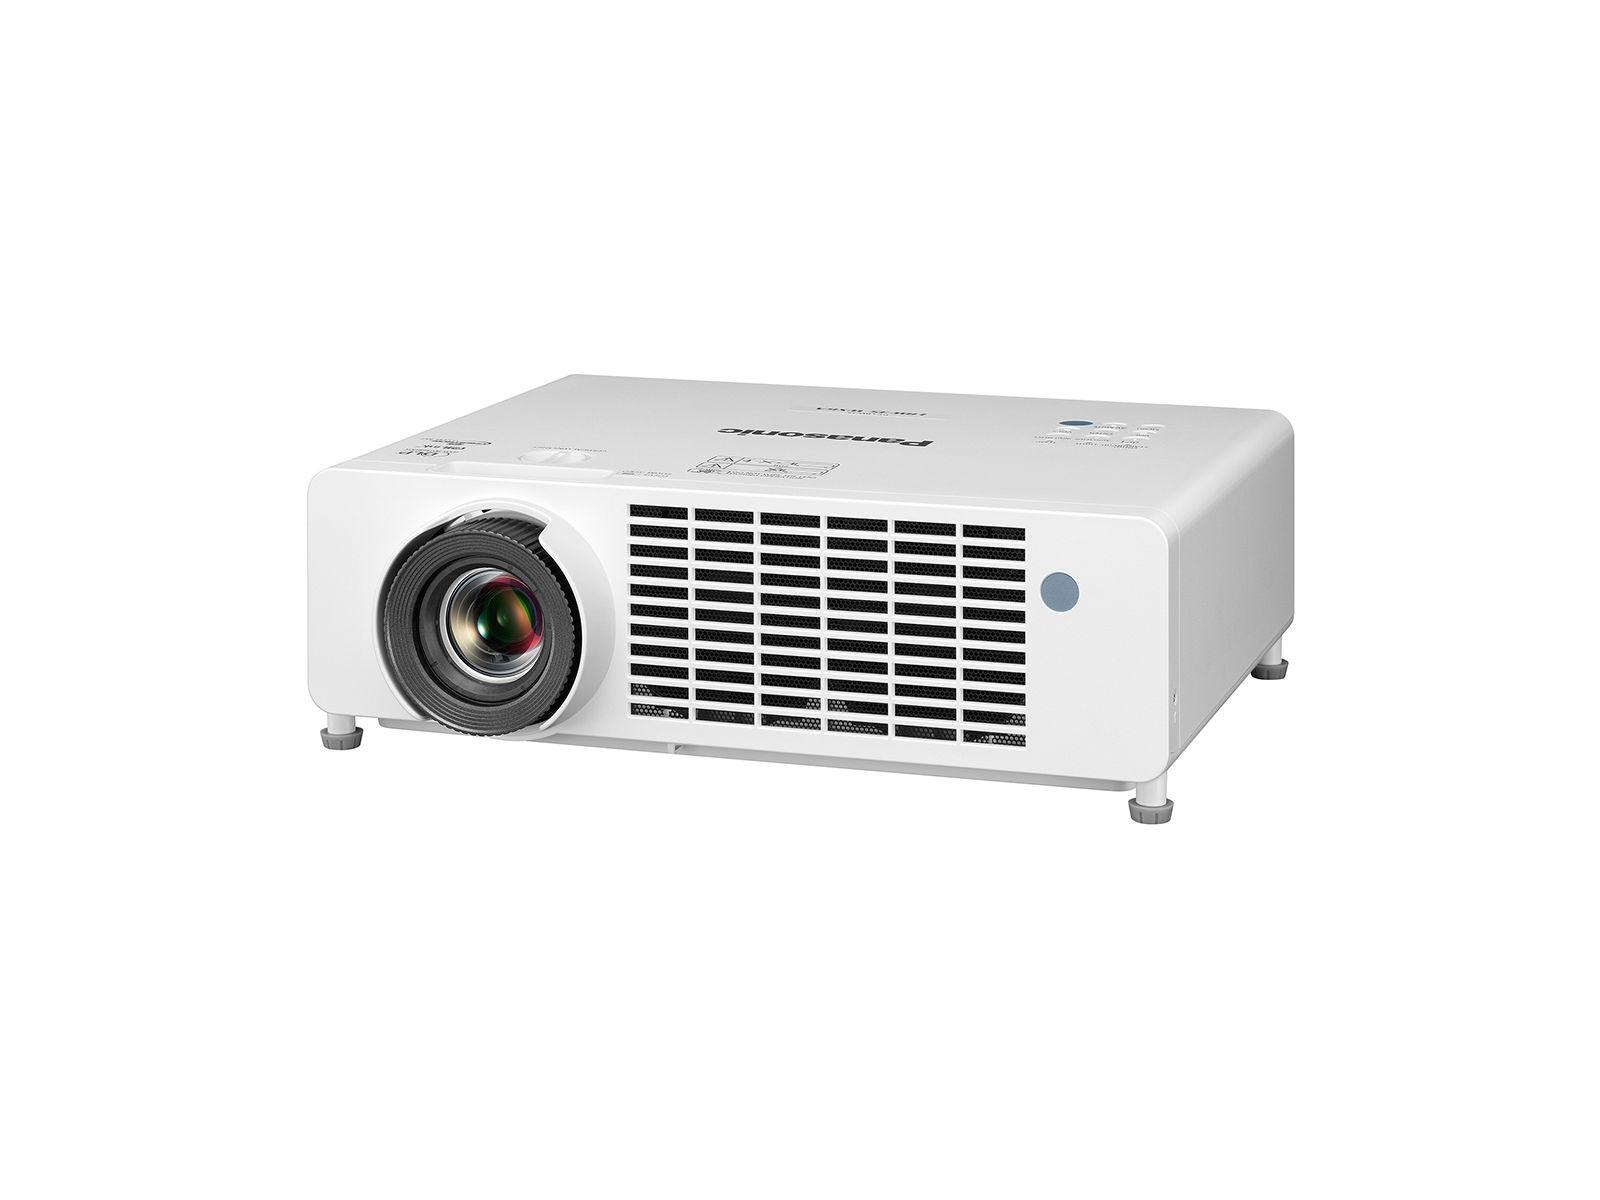 Panasonic PT-LRW35 | 1-Chip DLP mit RGB-LED-Lichtquelle; WXGA (1.280 x 800); 3.500 ANSI-L; Kontrast 30.000:1; Geräuschar